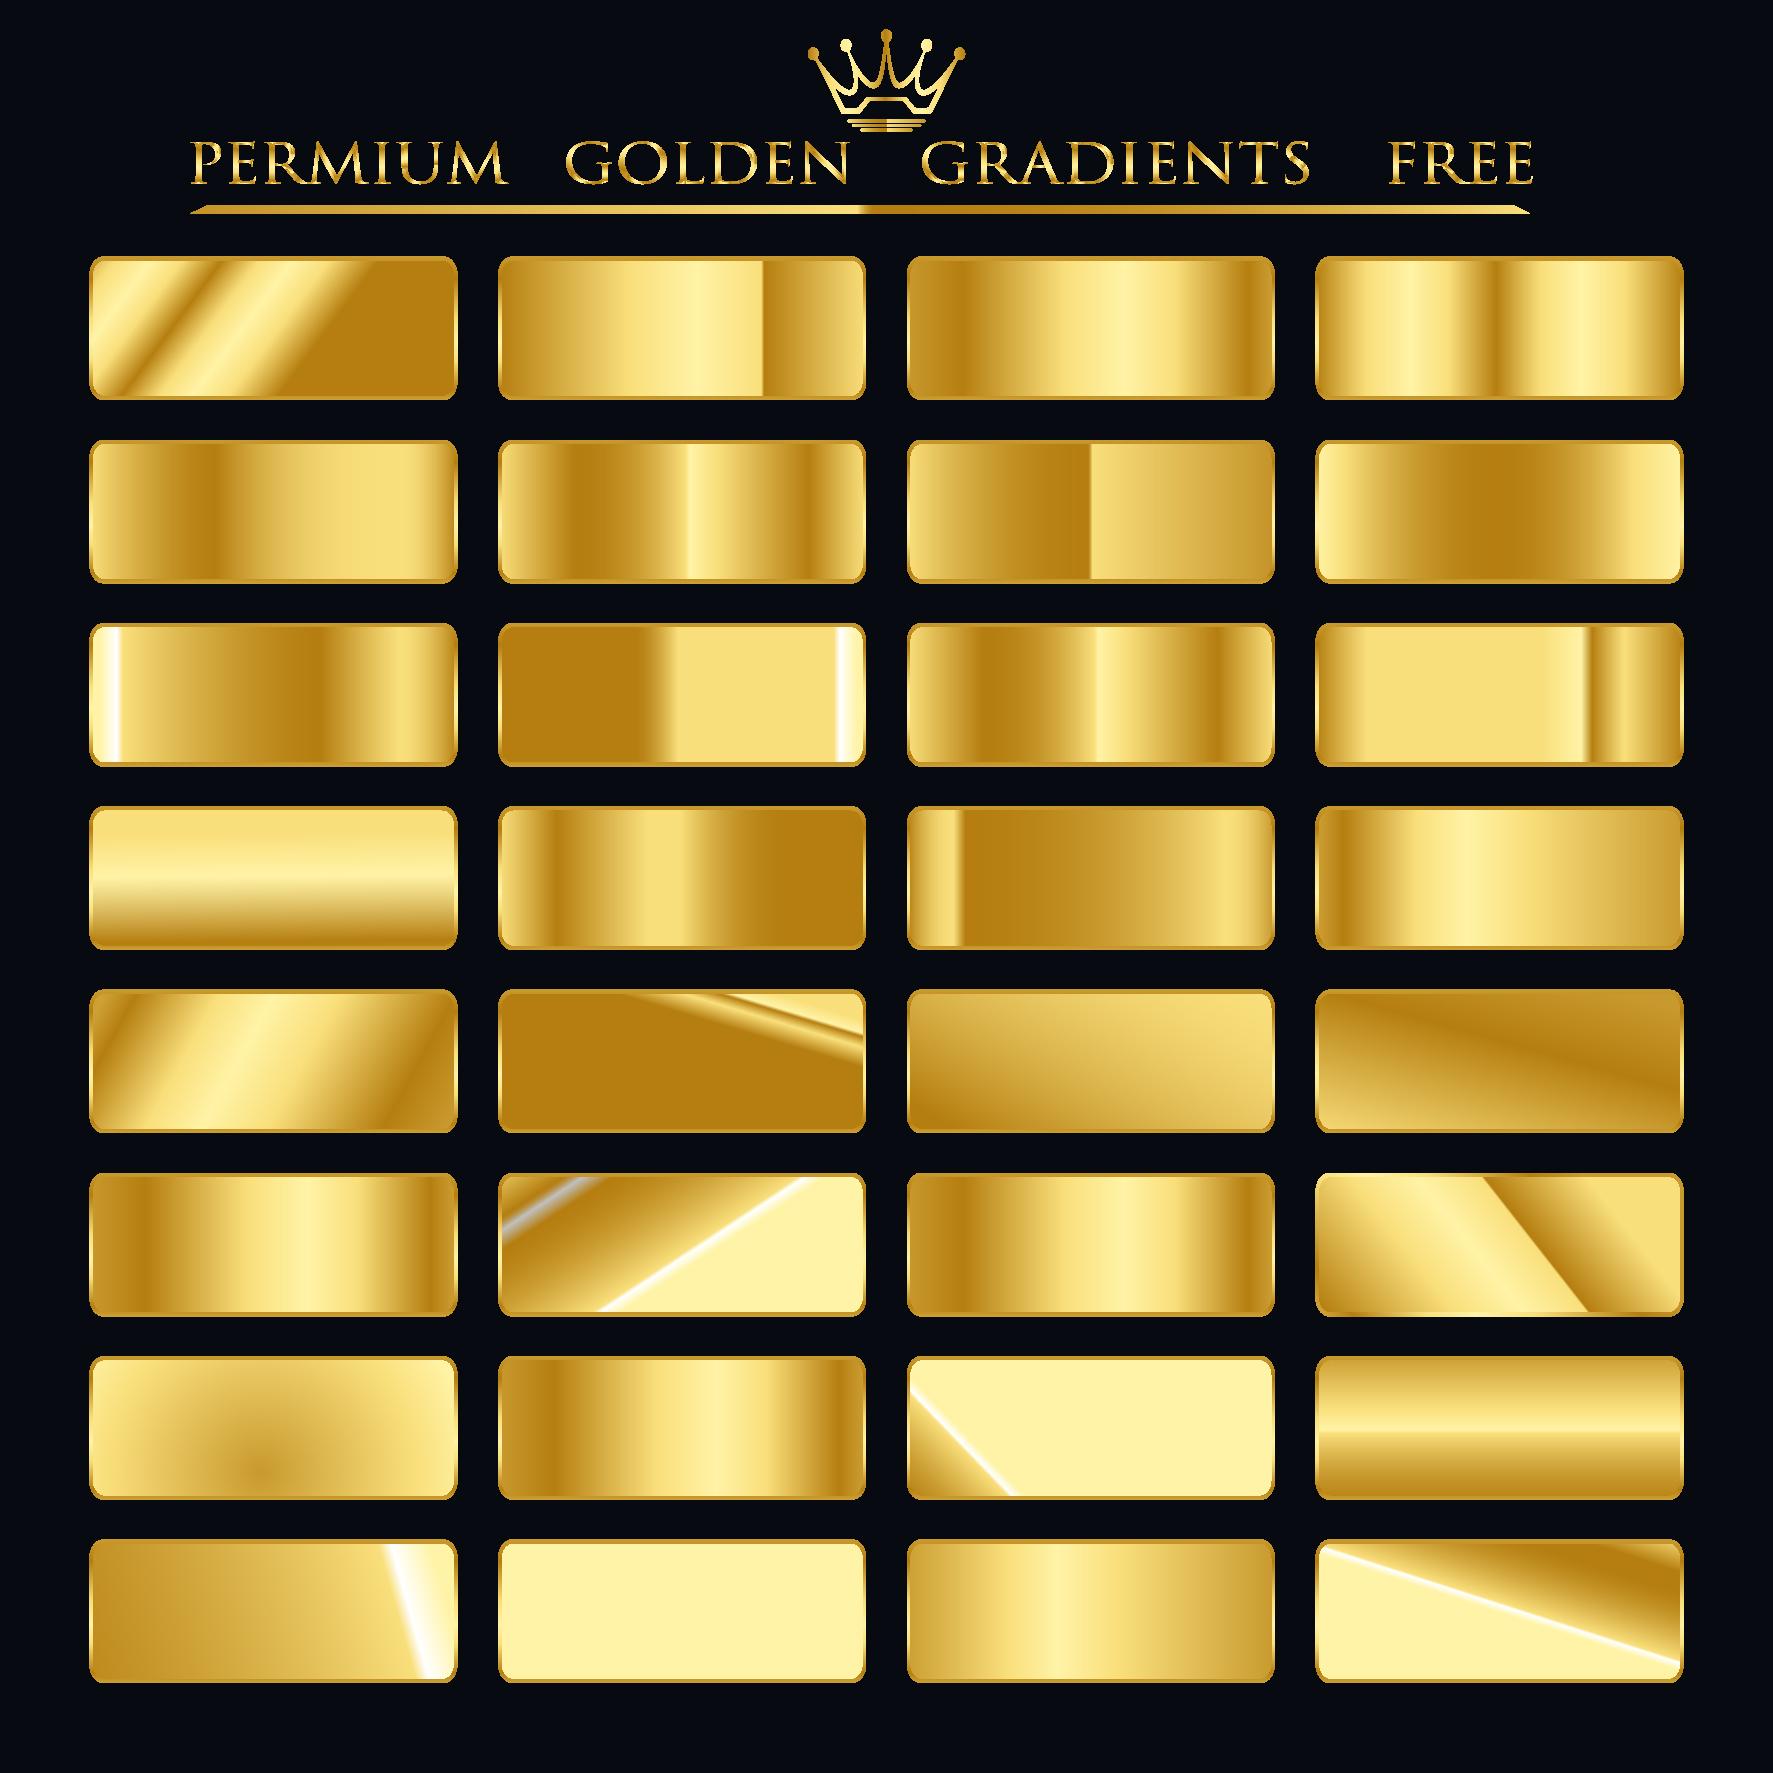 Premium Golden Gradients For FREE